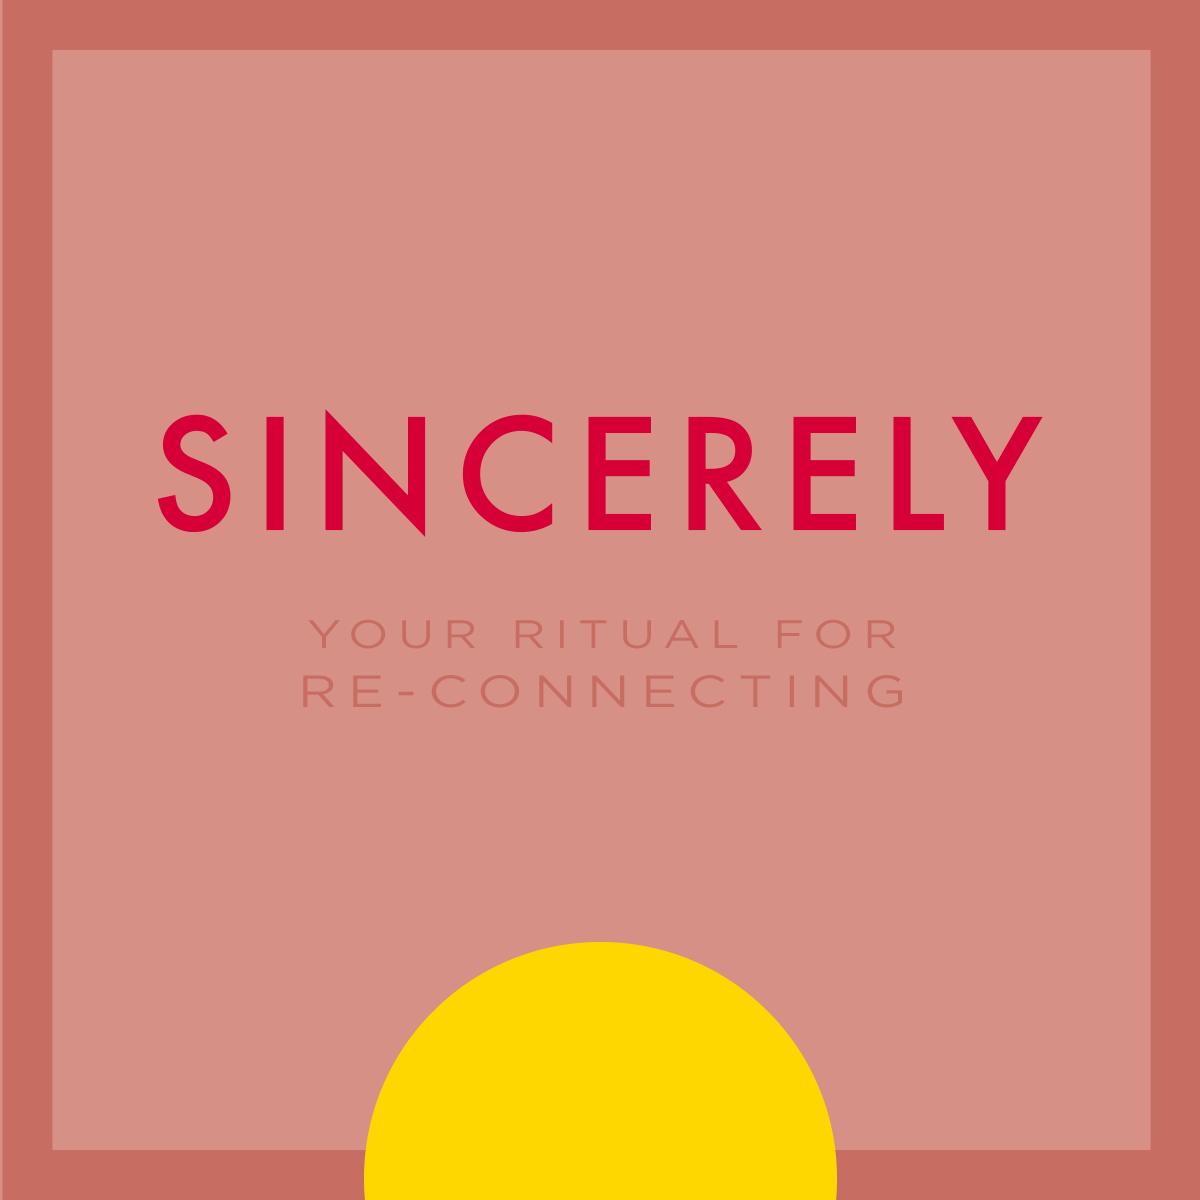 Sincerely-Digital-Art-SQUARE-01.jpg